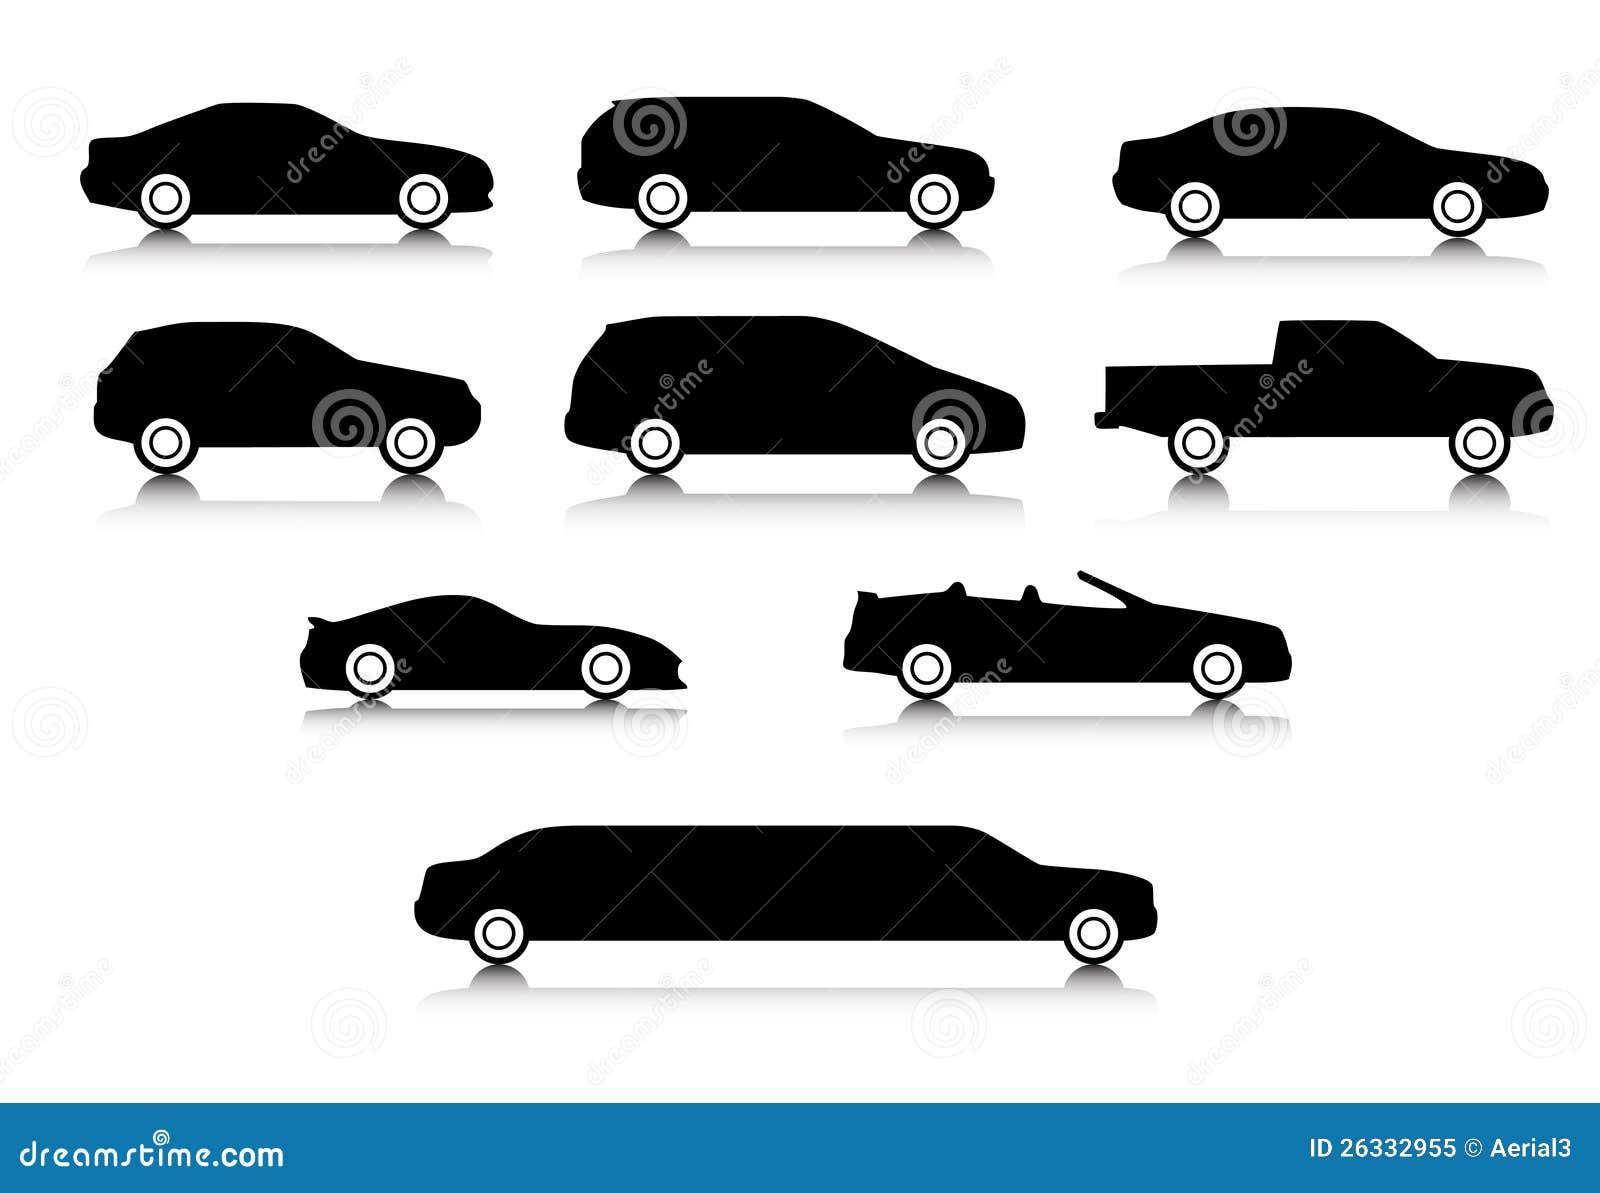 Car Body Types Stock Vector - Image: 65038161